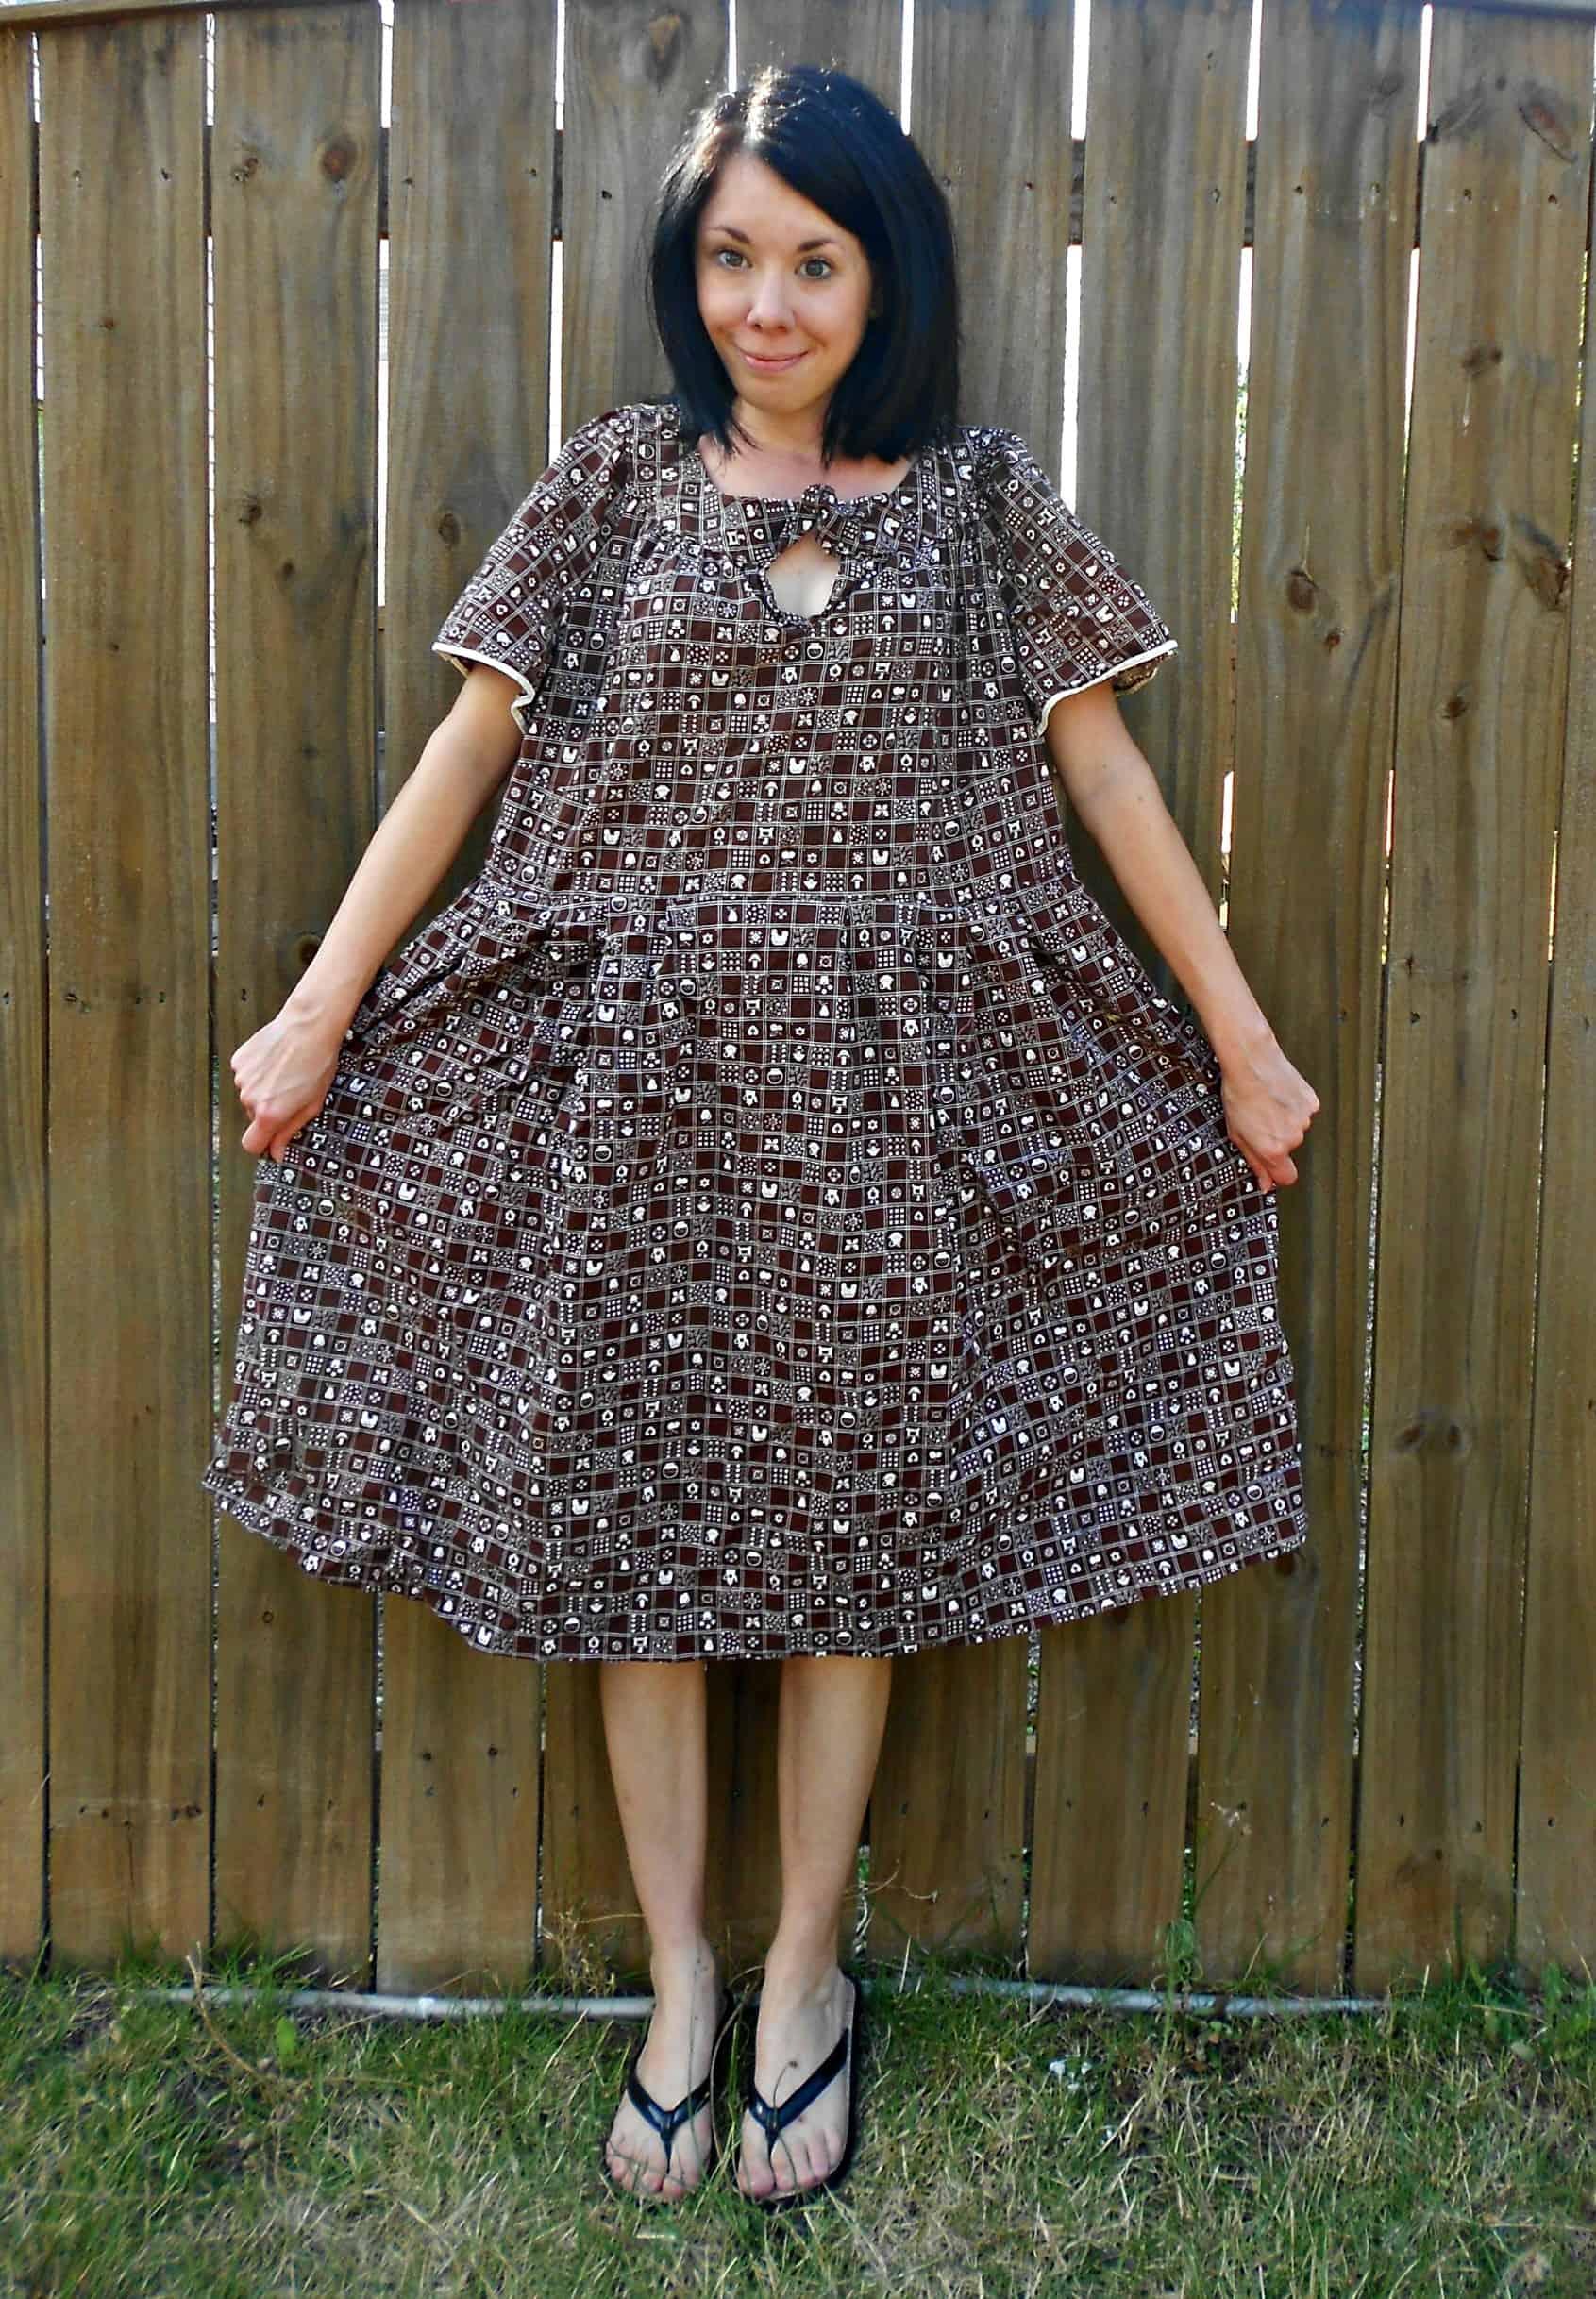 Day 365: Kitschy Dress 2